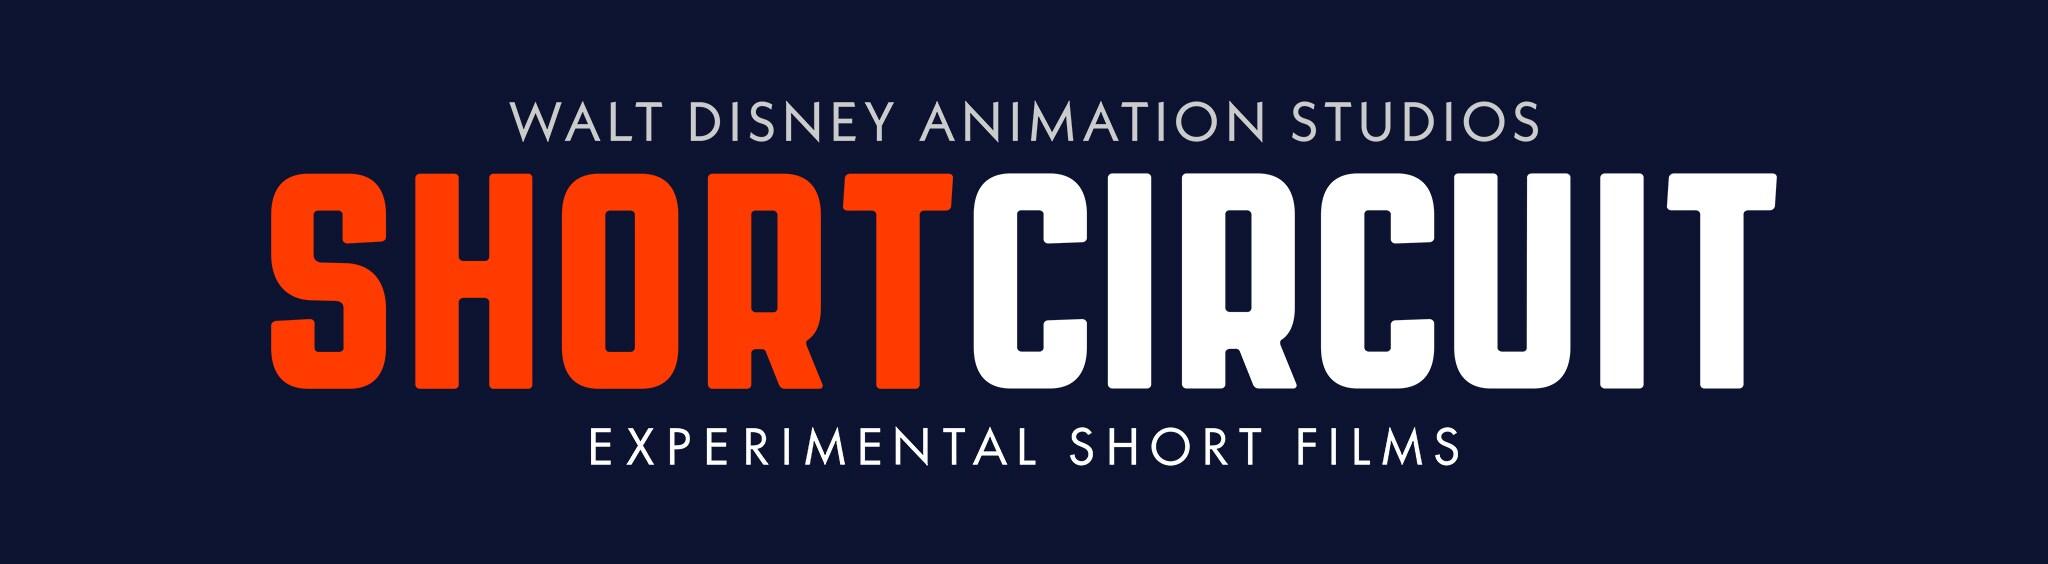 Walt Disney Animation Studios | Short Circuit | Experimental Short Films